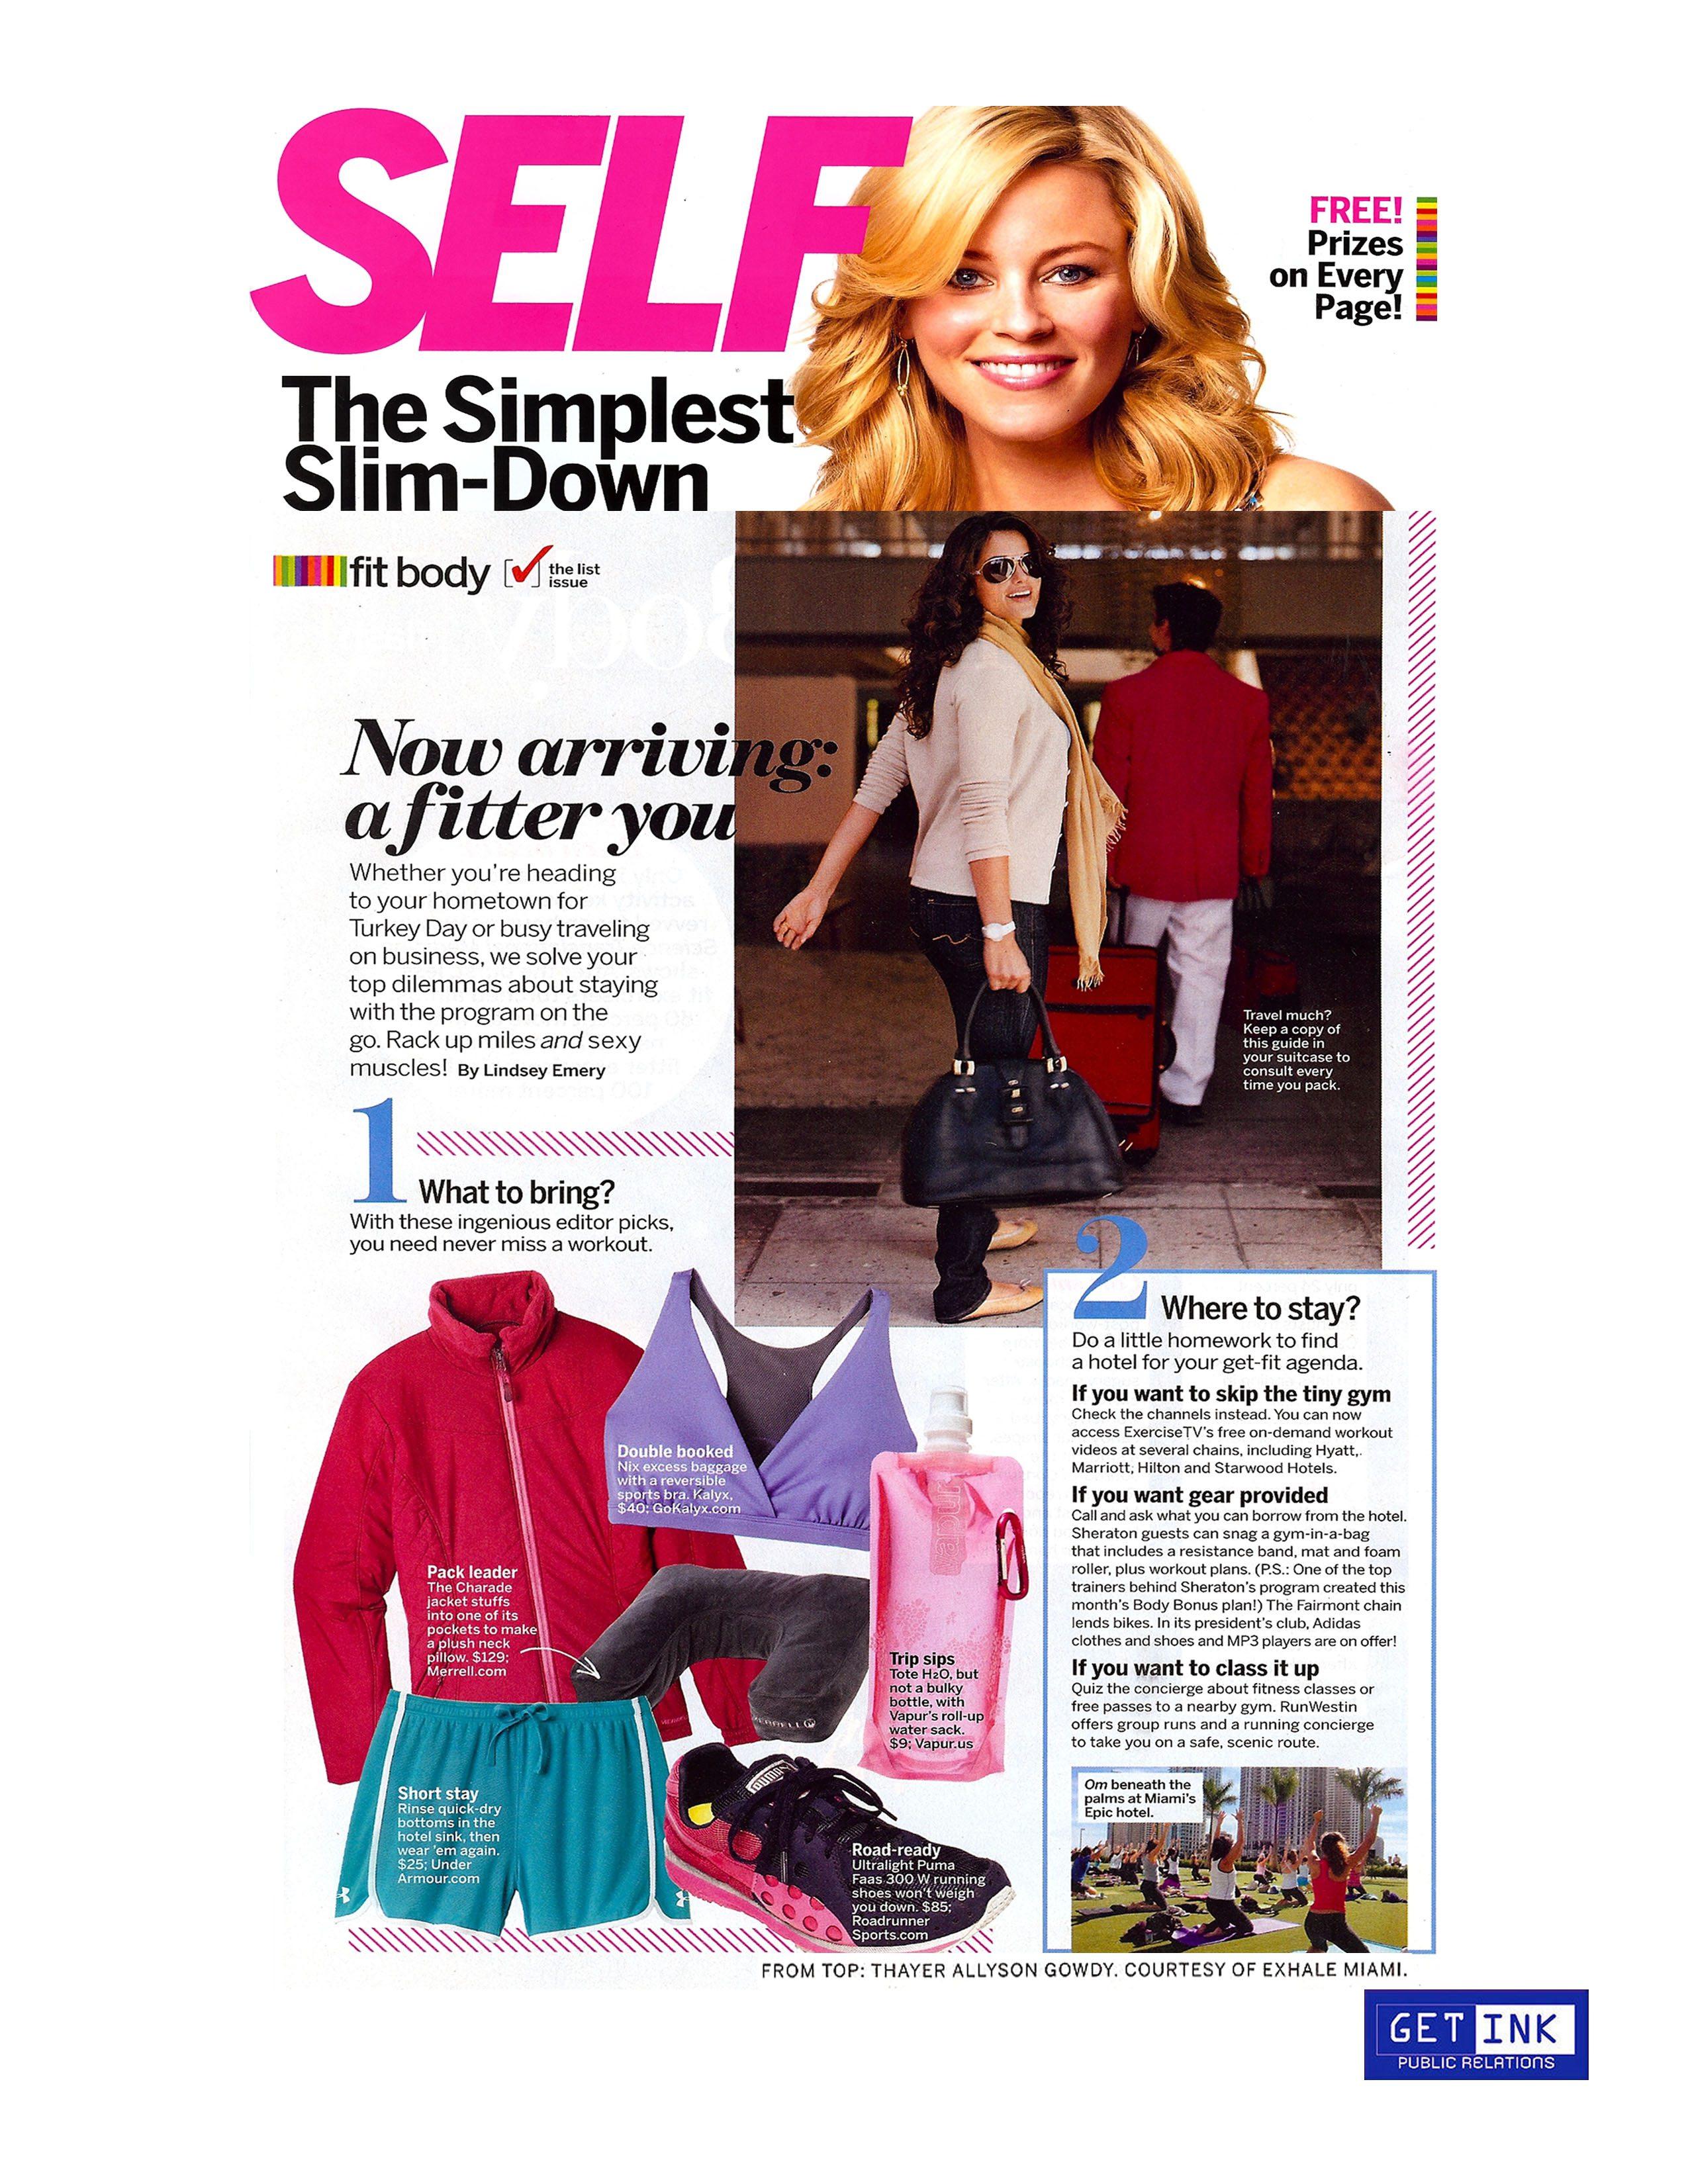 Exhale Spa Miami in Self Magazine - Get Ink PR